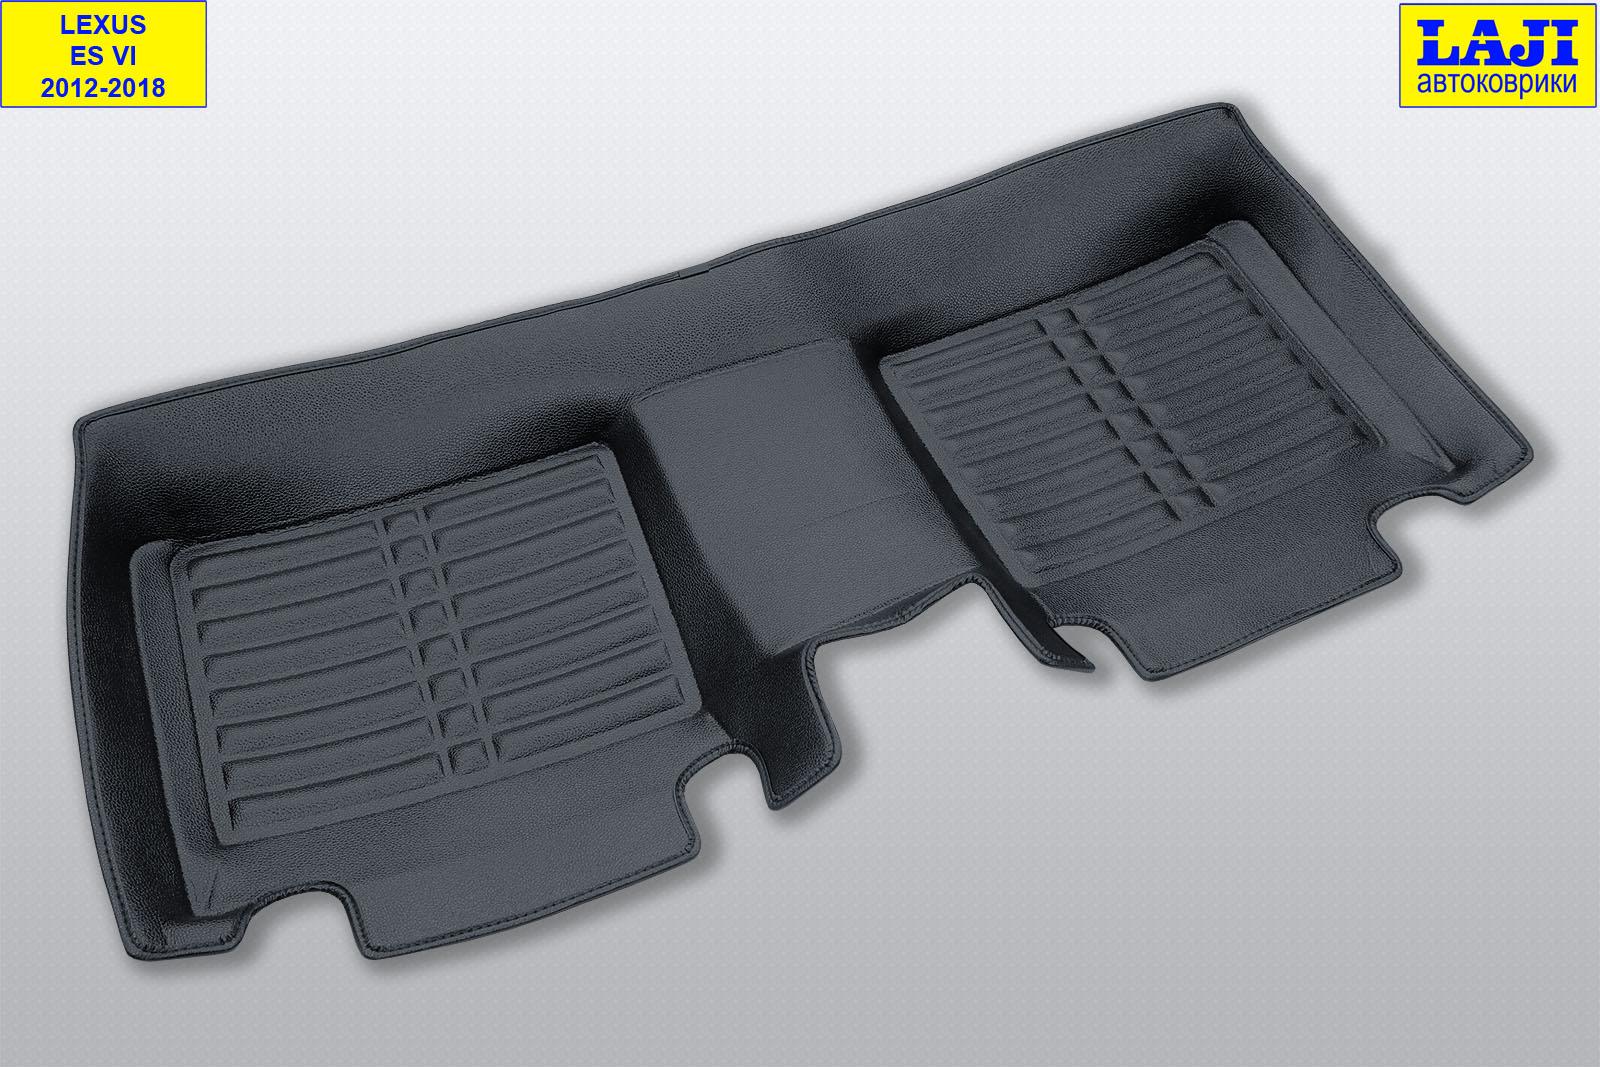 5D коврики в салон Lexus ES VI 2012-2018 10